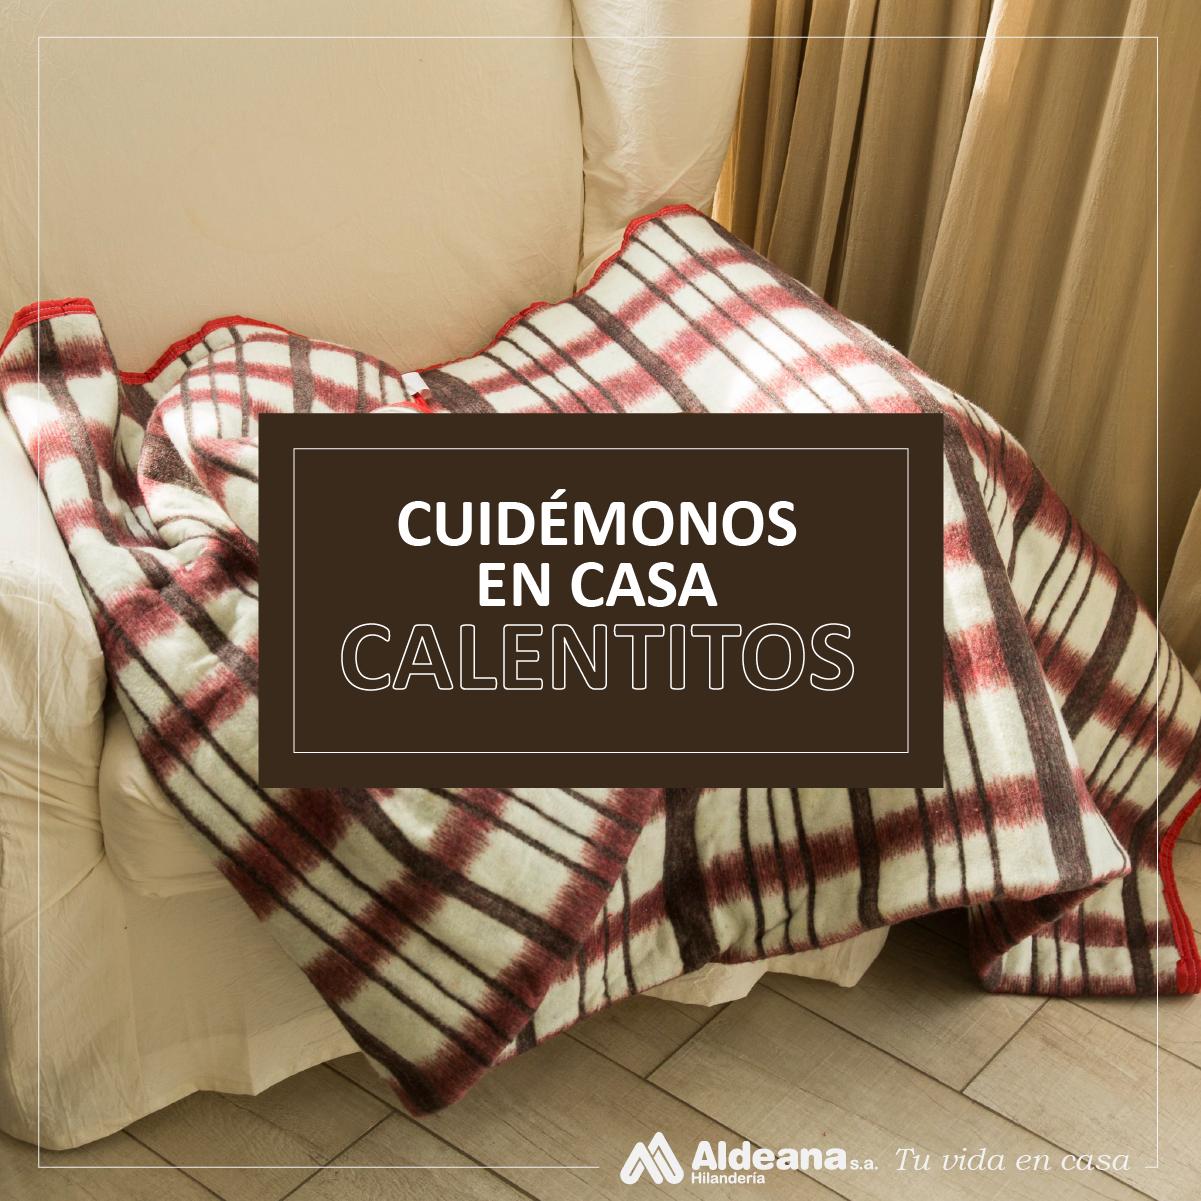 Cuidémonos en casa - Aldeana